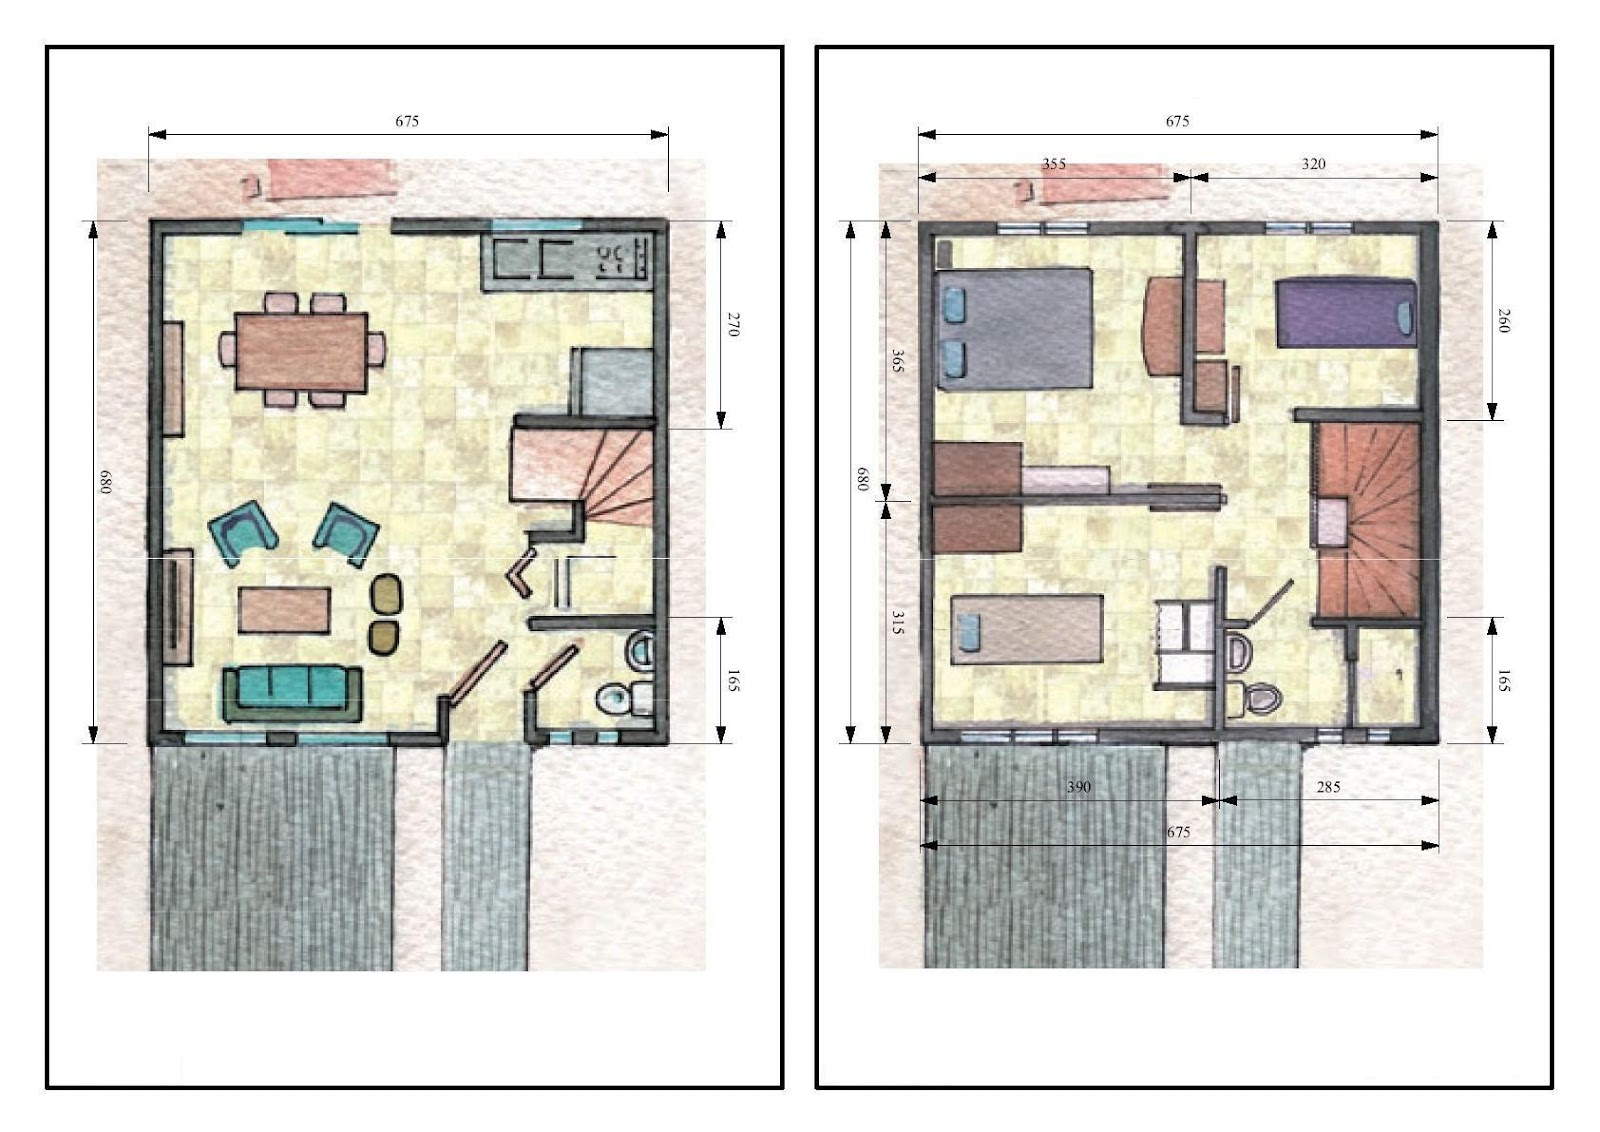 Planos de casas modelos y dise os de casas planos for Planos arquitectonicos de casas